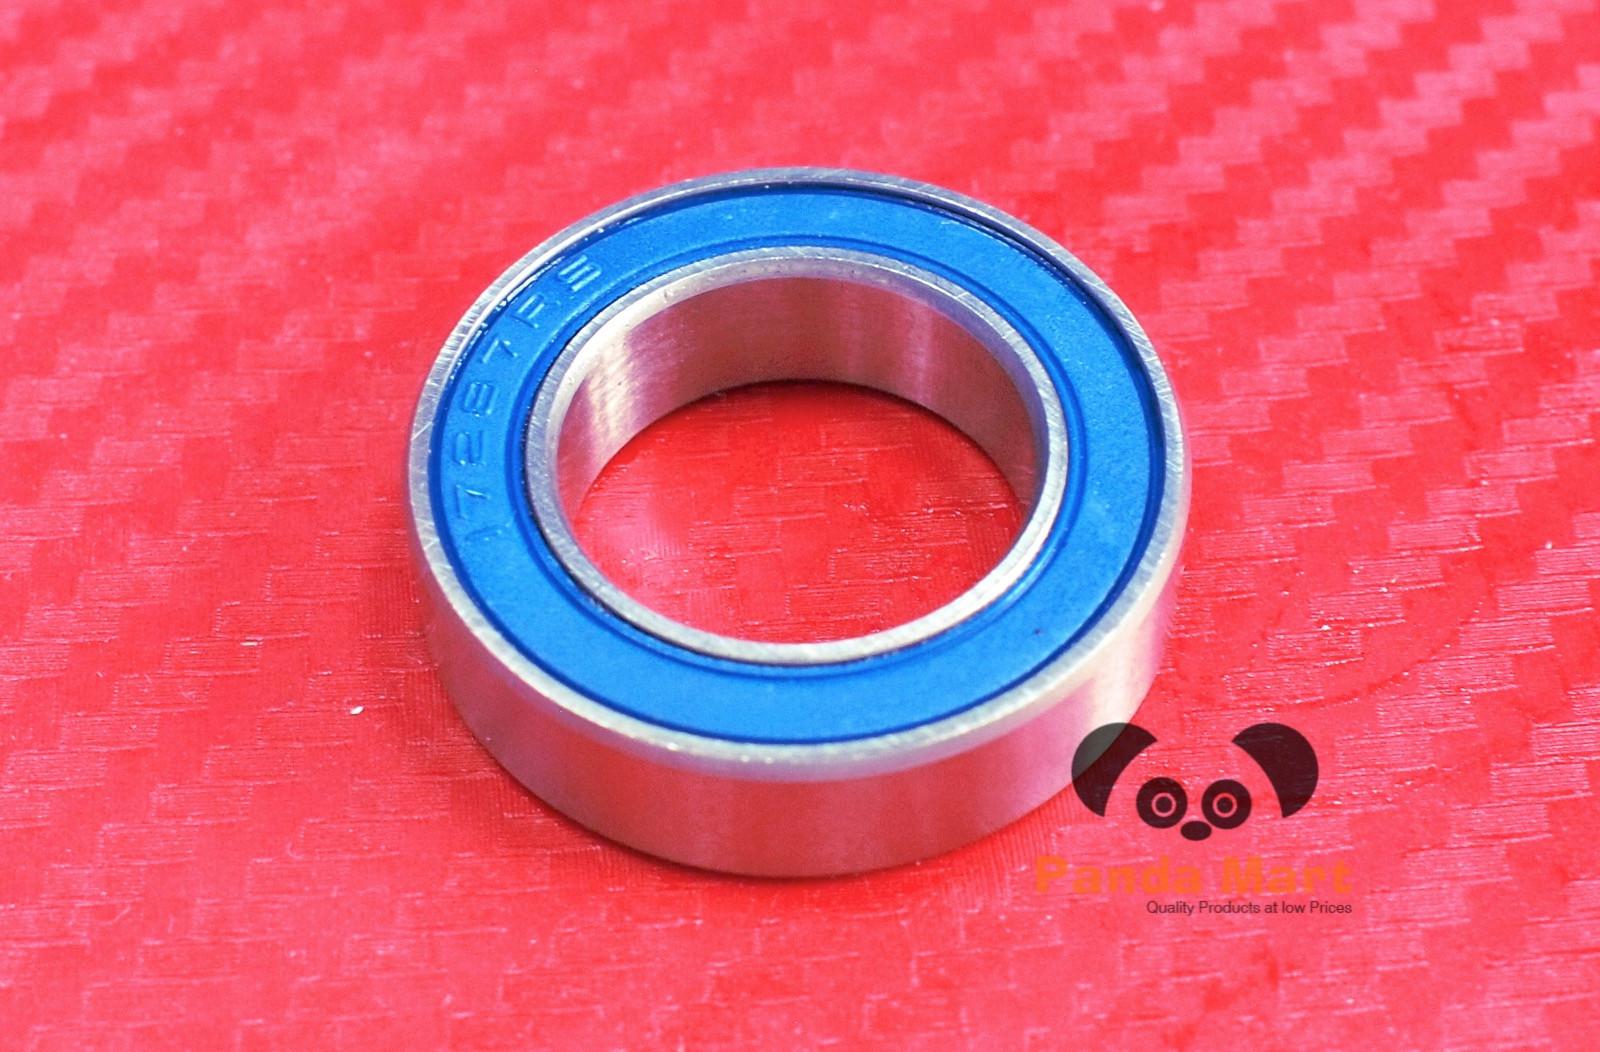 Rubber Ball Bearing Bearings 6805RS//W6 25*37*6 10pc 6805-2RS//W6 25x37x6 mm